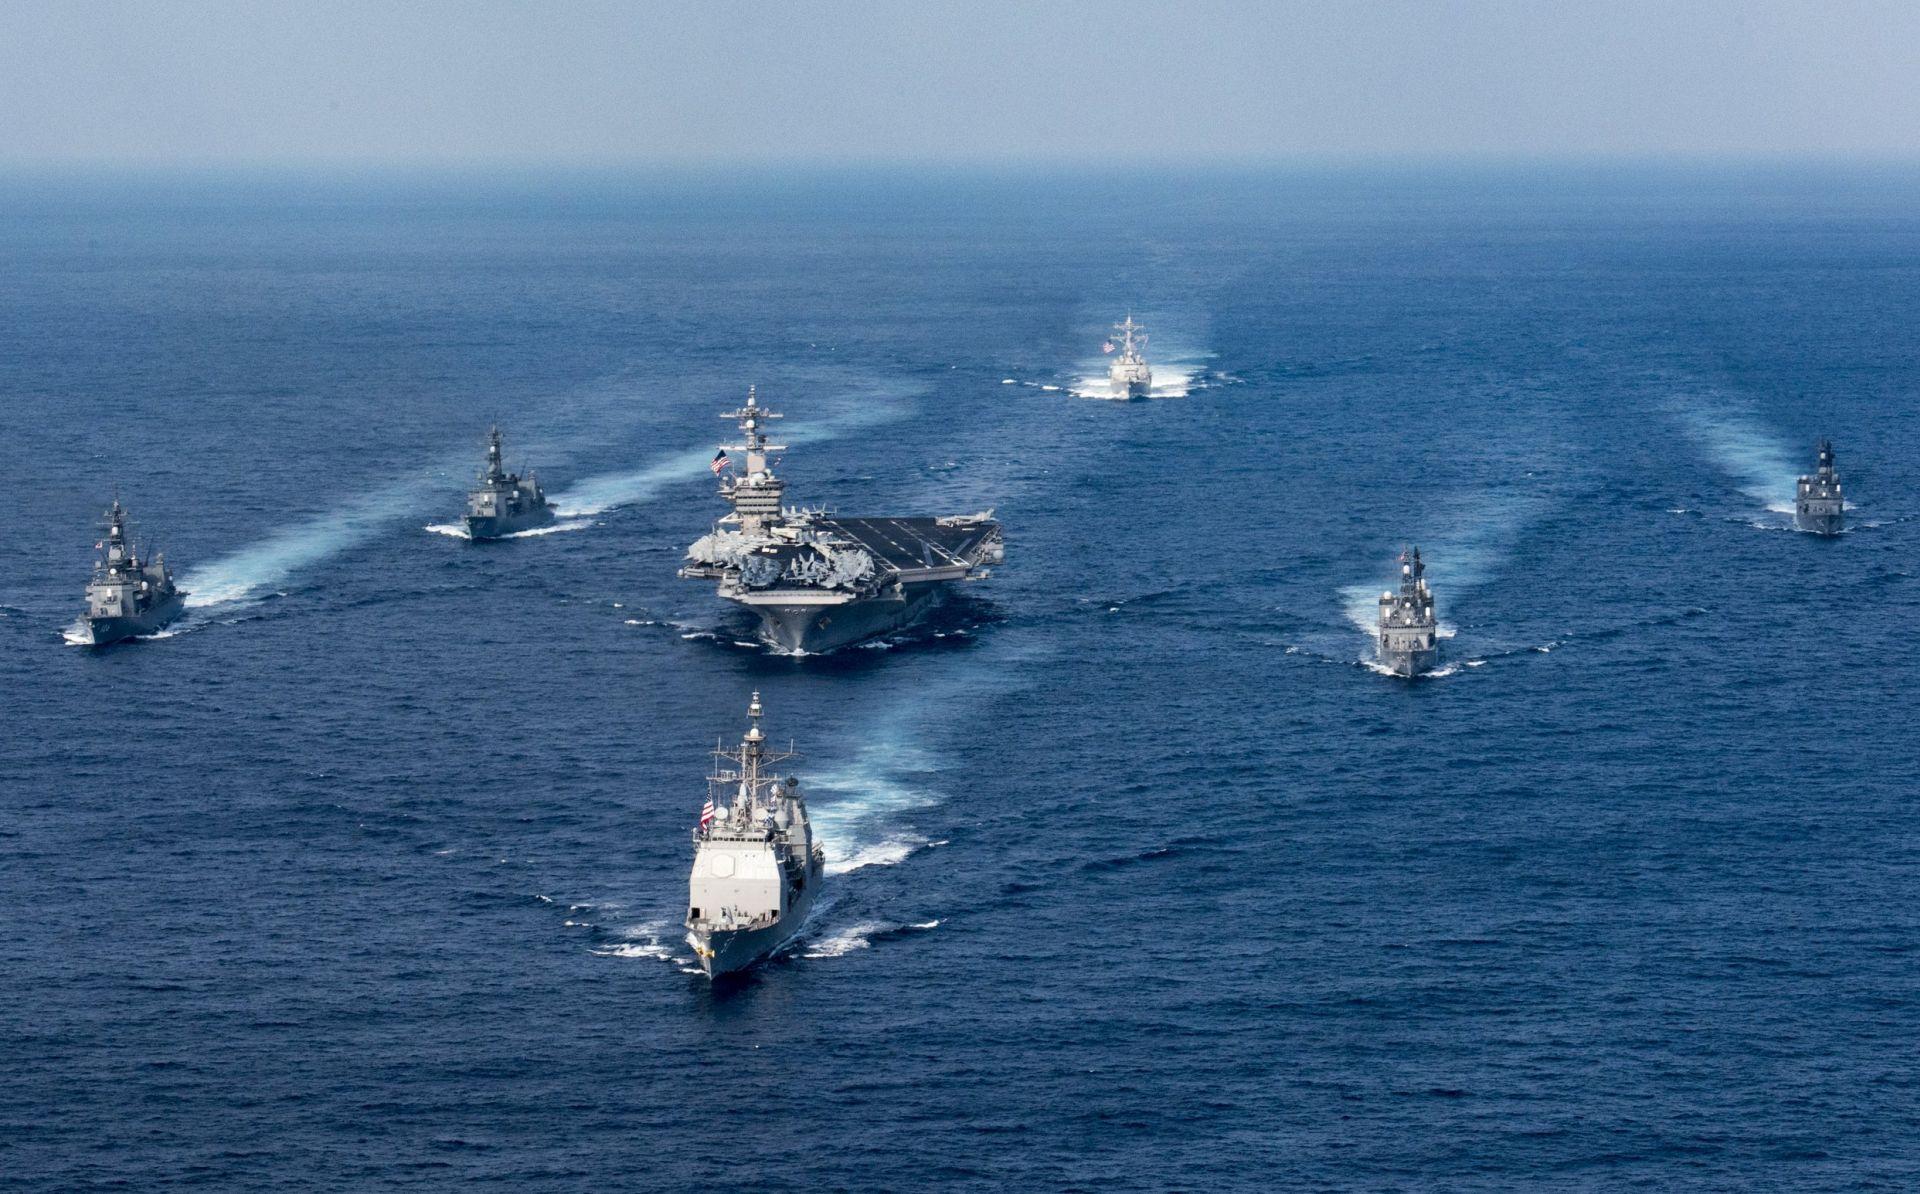 Sjeverna Koreja objavila da je spremna potopiti američki nosač zrakoplova